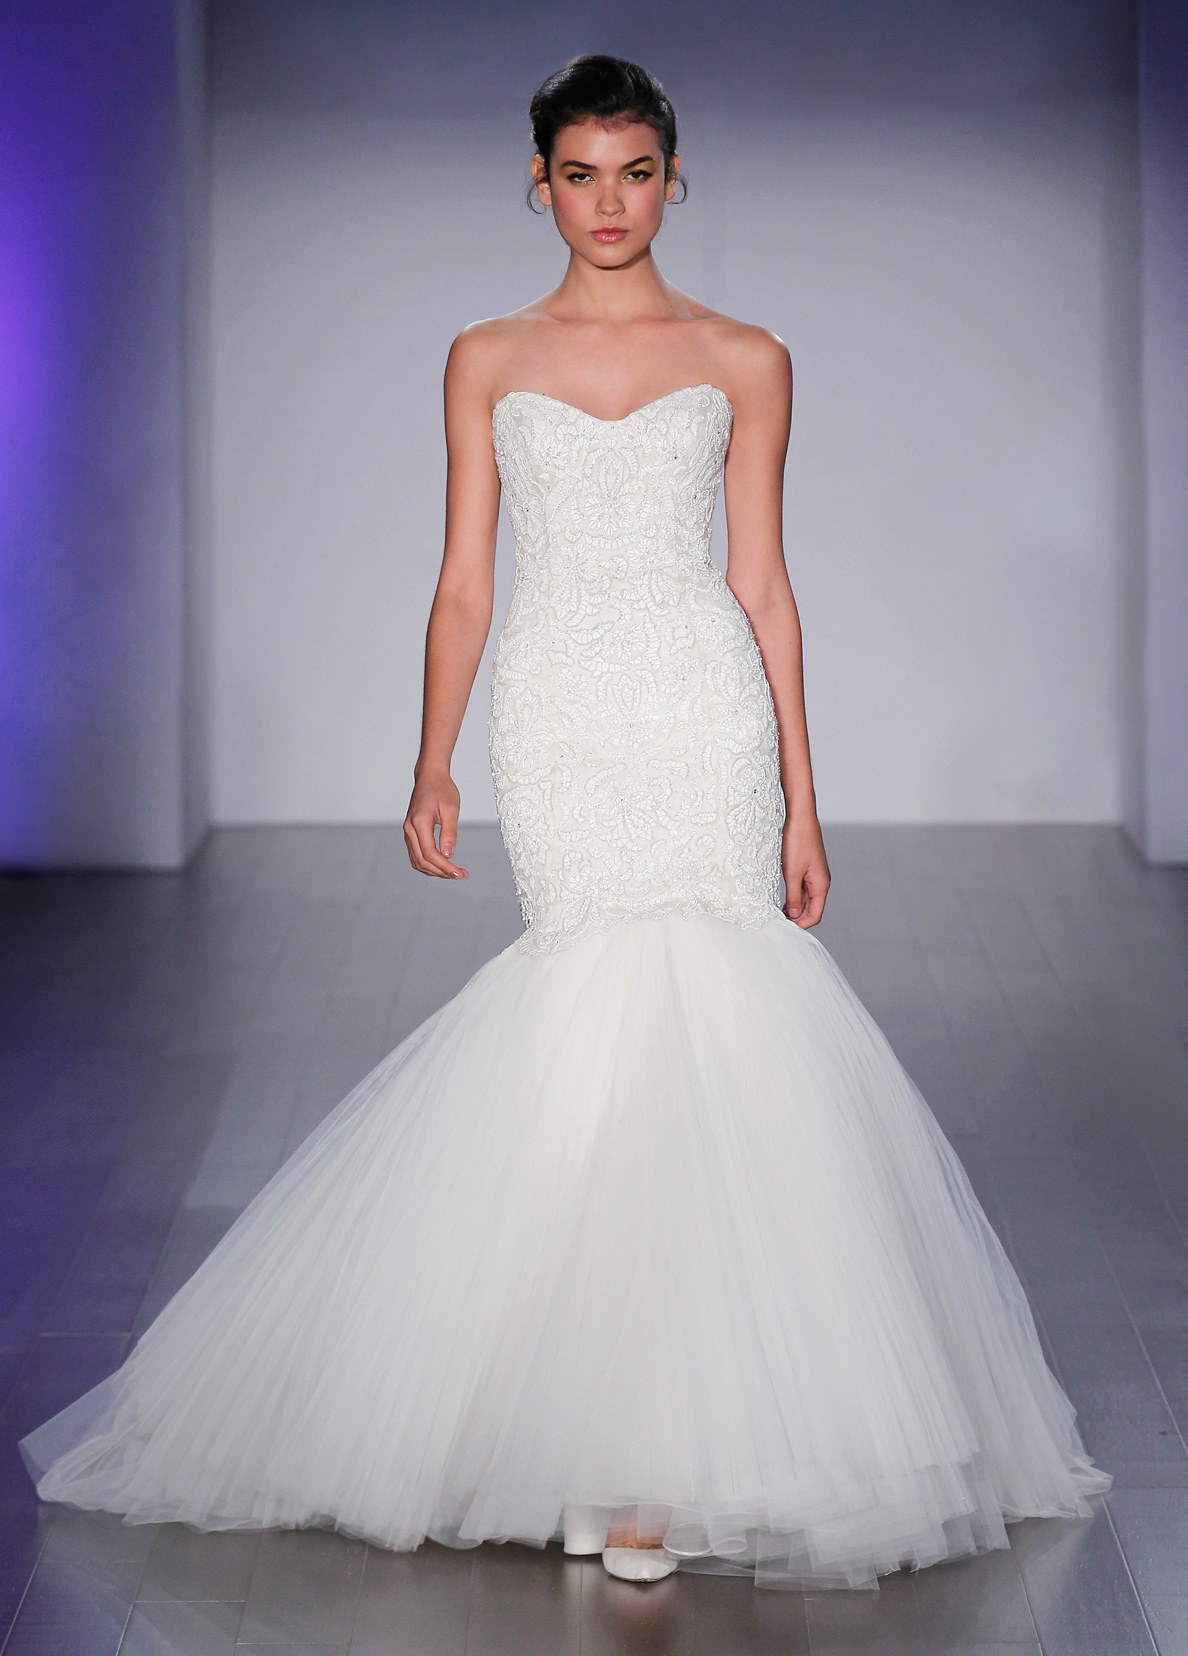 hjelm bridal additional style